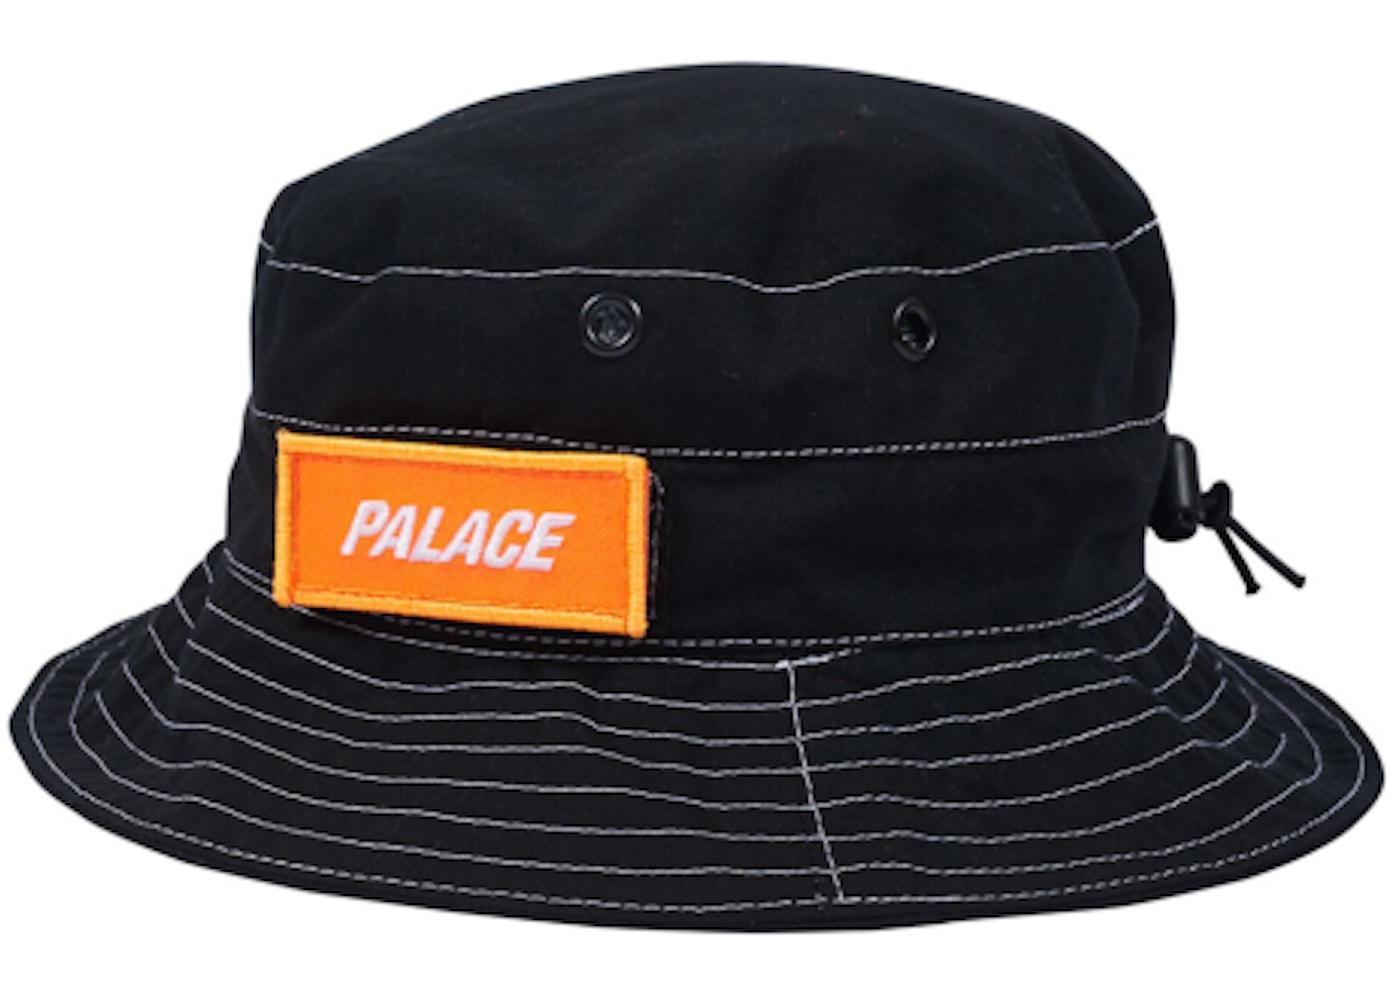 862e7651 Palace Ark Air Boonie Hat Black/Orange - Spring 2018